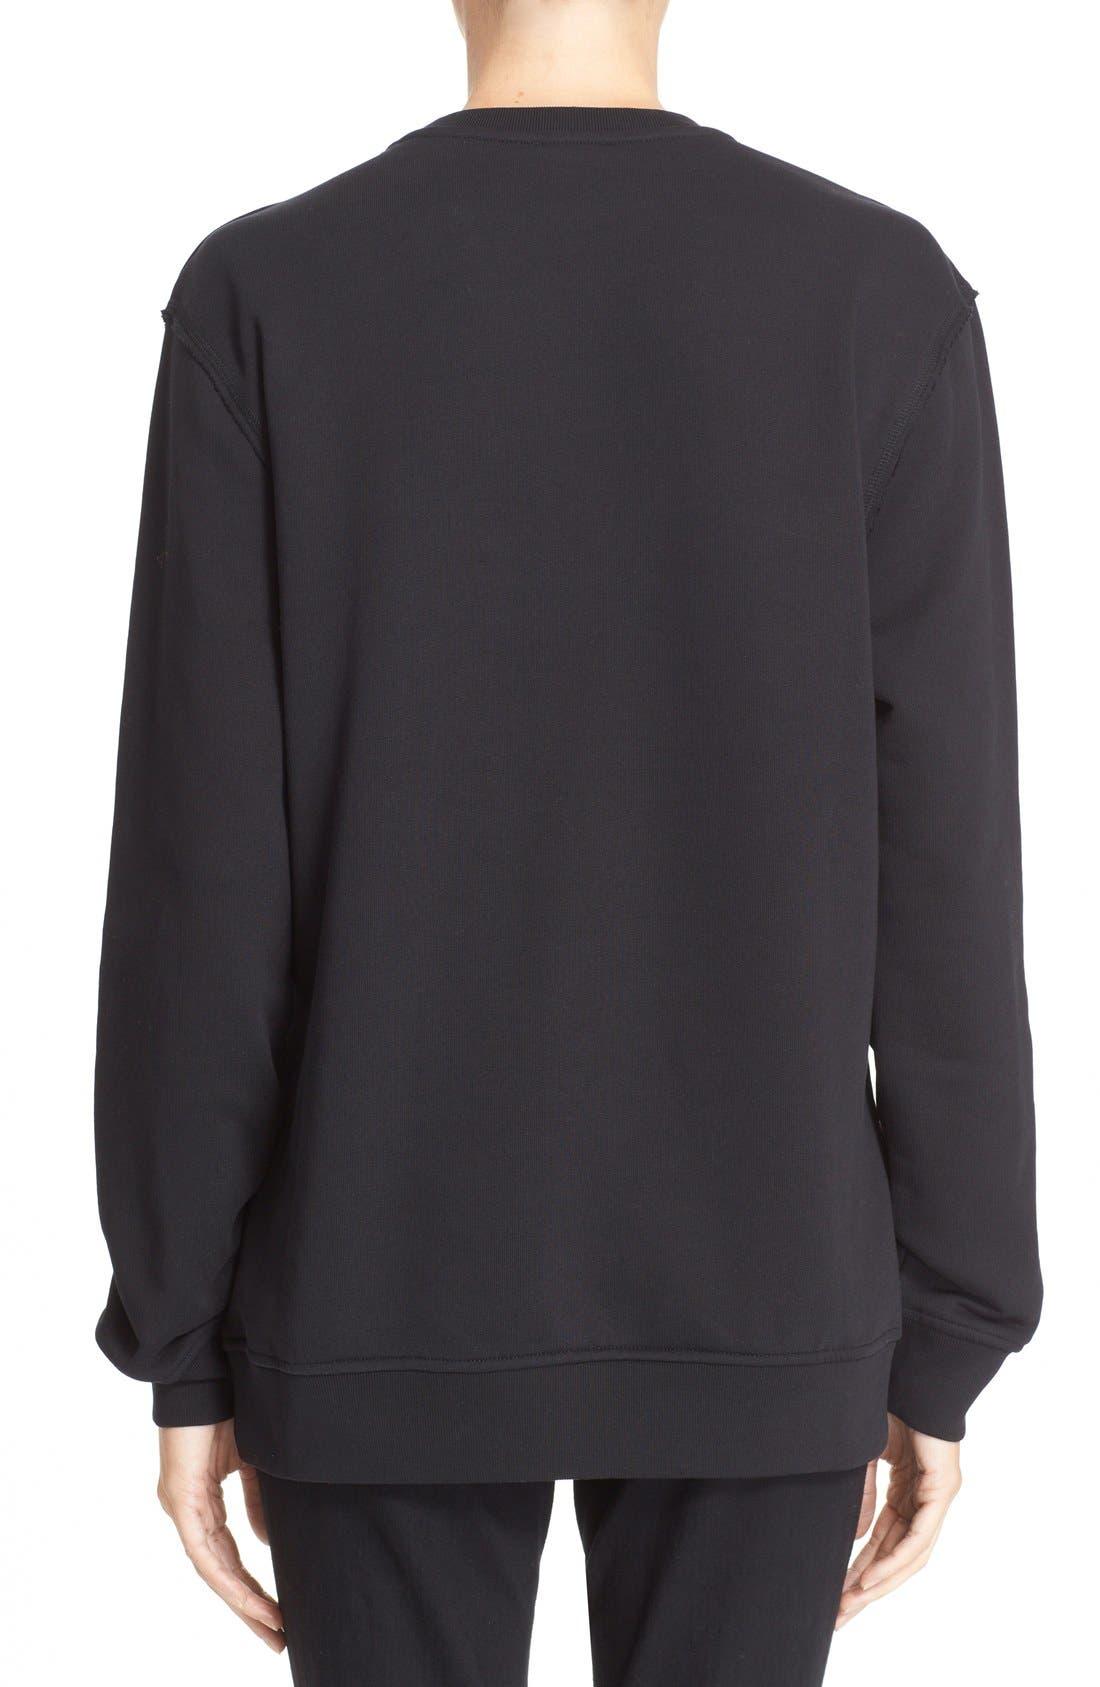 Alternate Image 2  - McQ by Alexander McQueen Oversized Graphic Sweatshirt